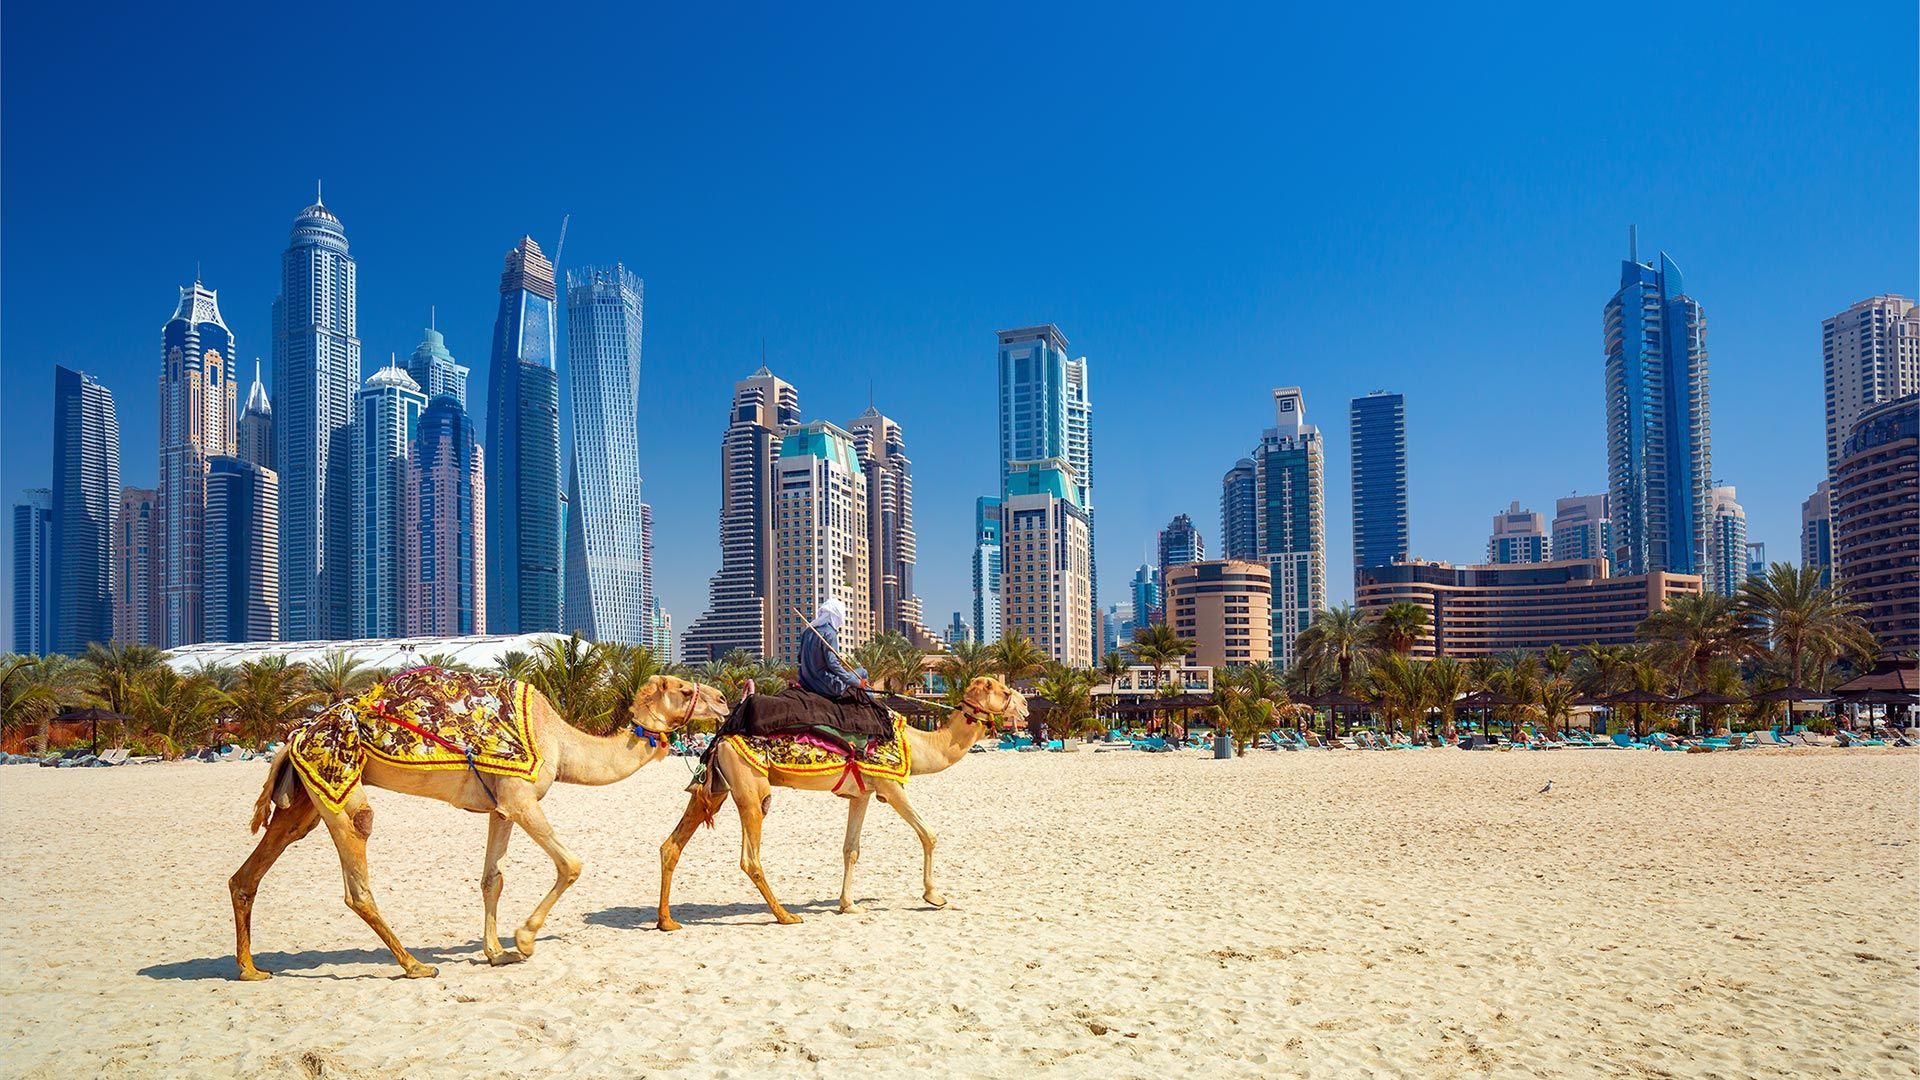 Sejur charter Dubai, EAU, 8 zile - februarie 2022